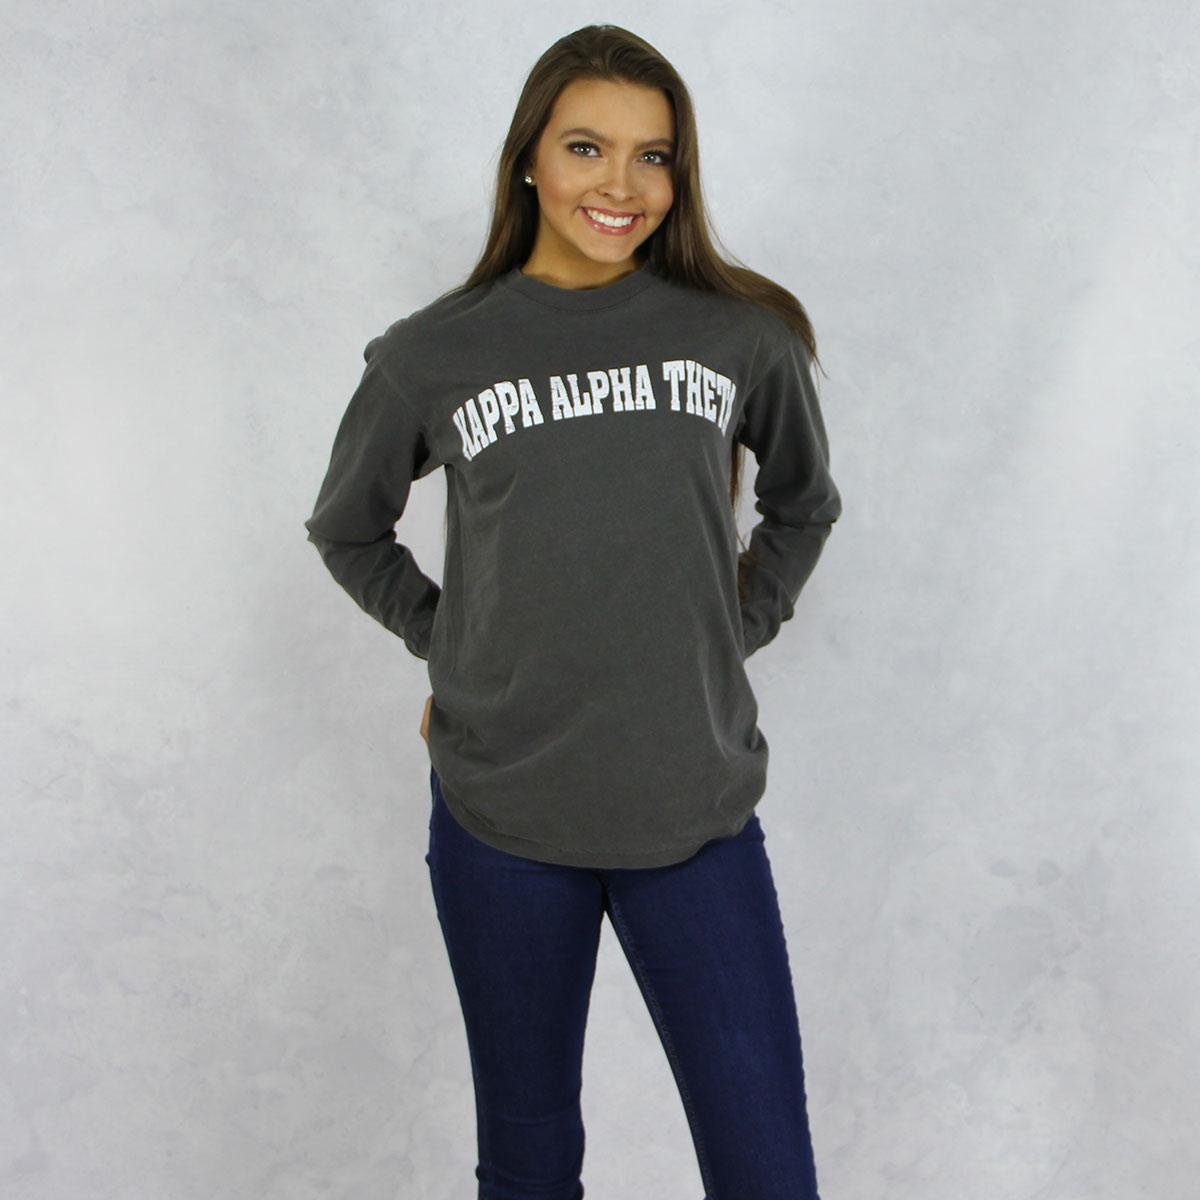 b15ac166 Kappa Alpha Theta - Comfort Colors Long Sleeve T-Shirt in Dark Gray